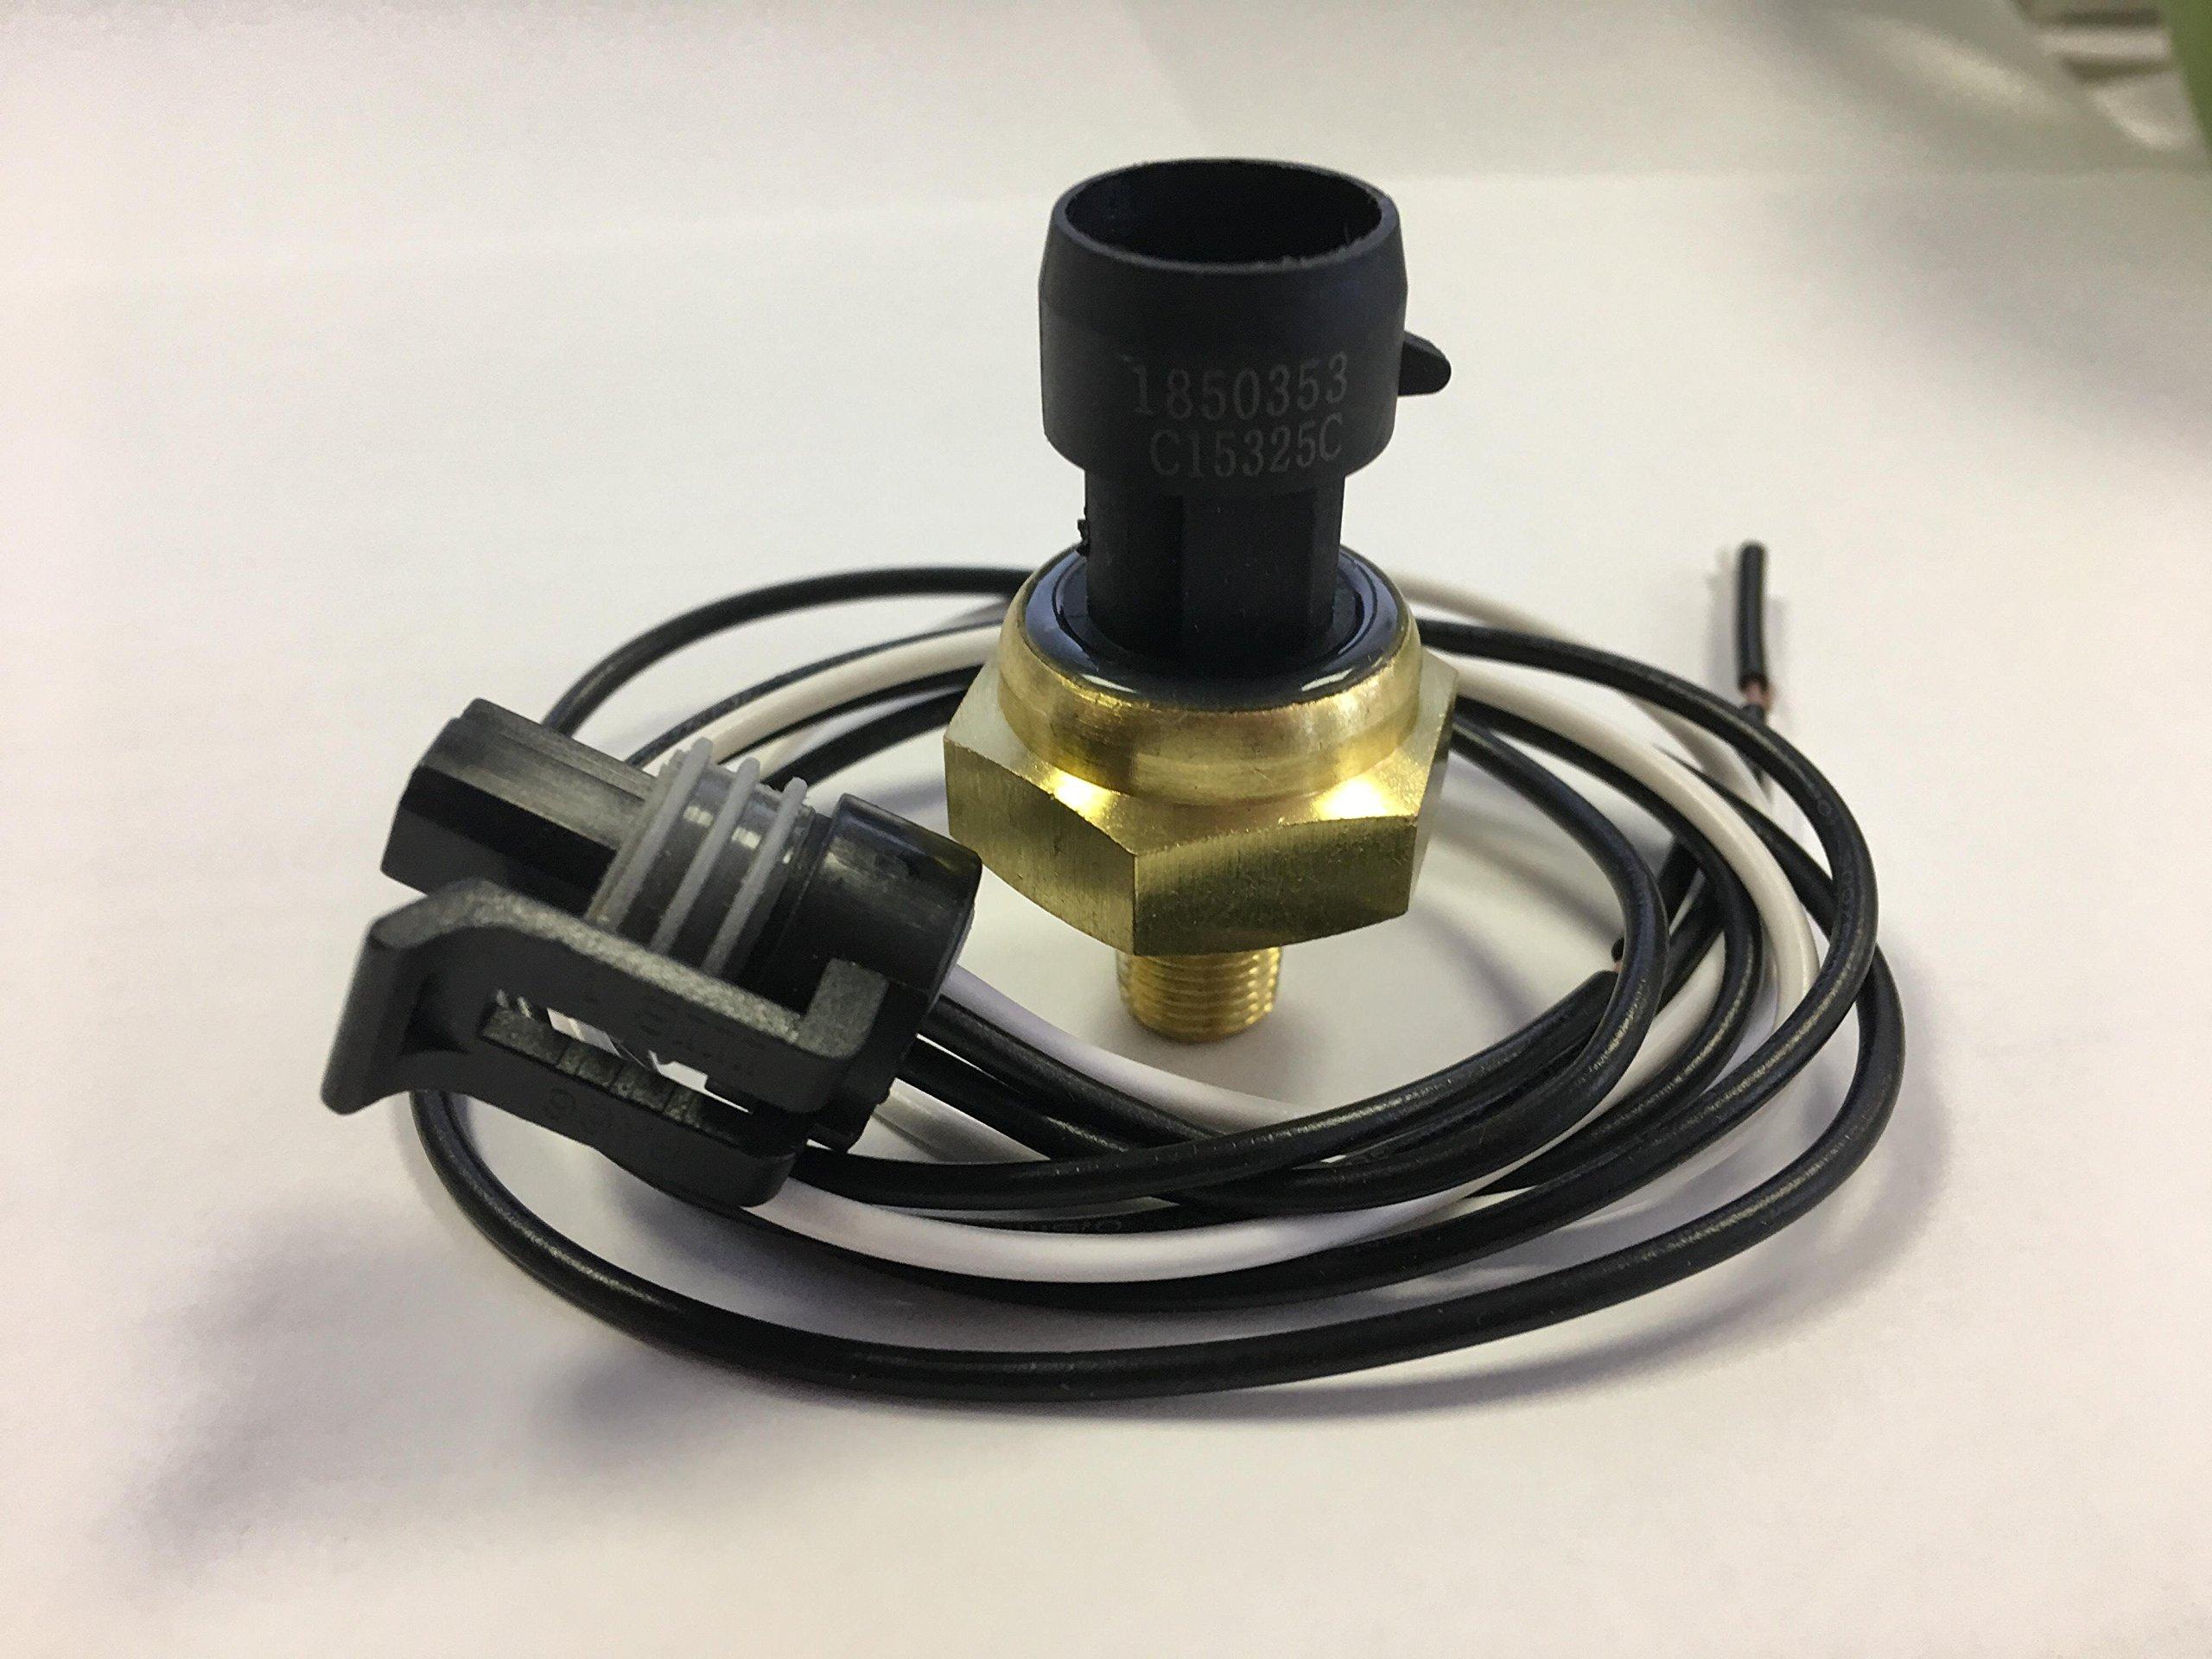 EGR EBP Pressure Sensor Replaces FORD/Motorcraft DPFE3 4C3Z-9J460A With Plugwire 1996-2003 7.3L & 6.0L Powerstoke